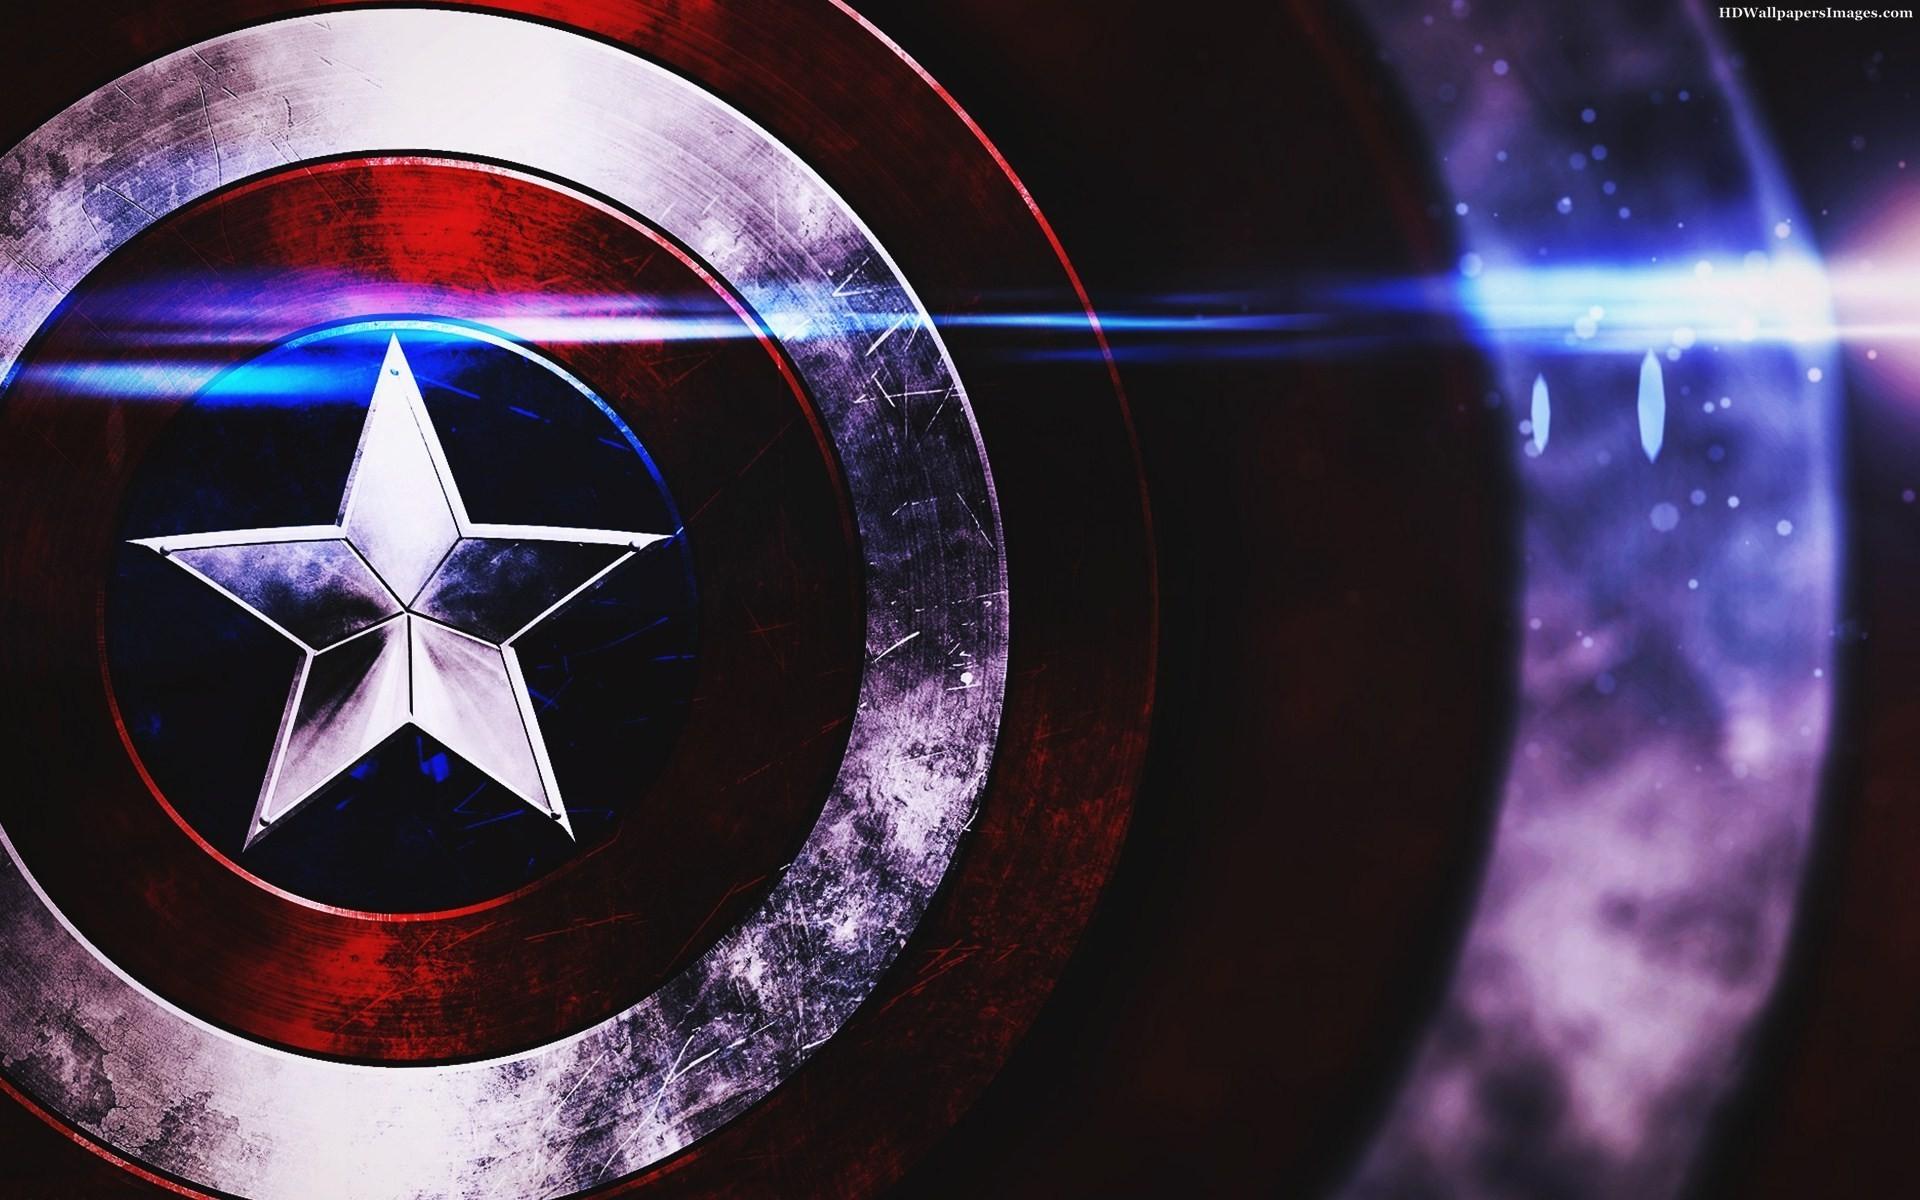 Captain America Wallpapers Best Wallpapers 1920×1080 Captain America  Wallpaper Hd (30 Wallpapers)